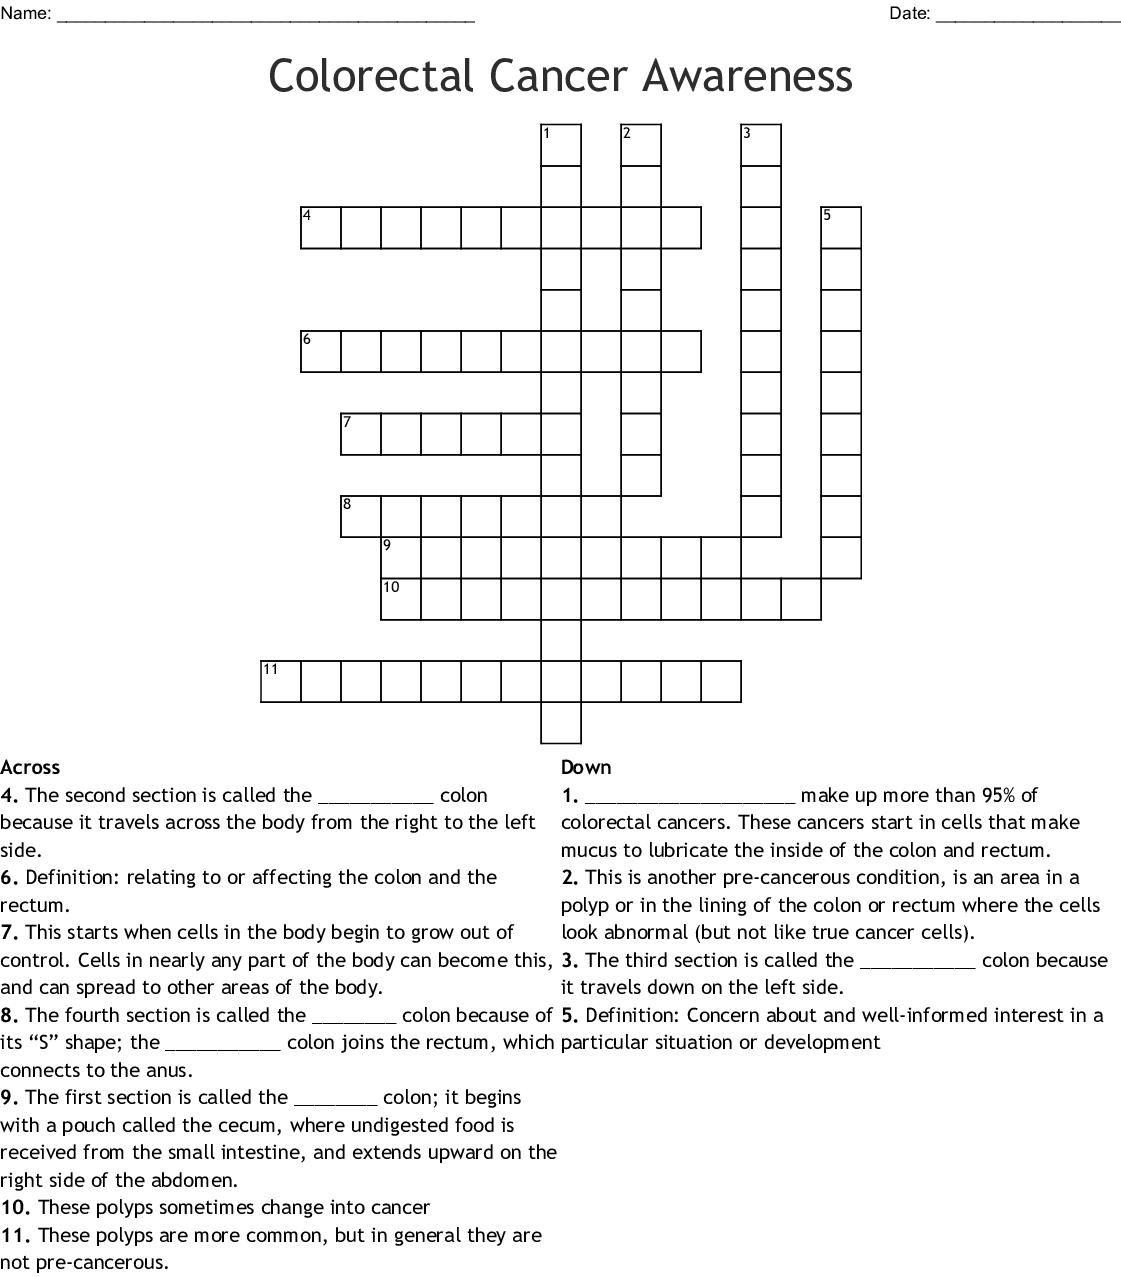 Colorectal Cancer Awareness Crossword